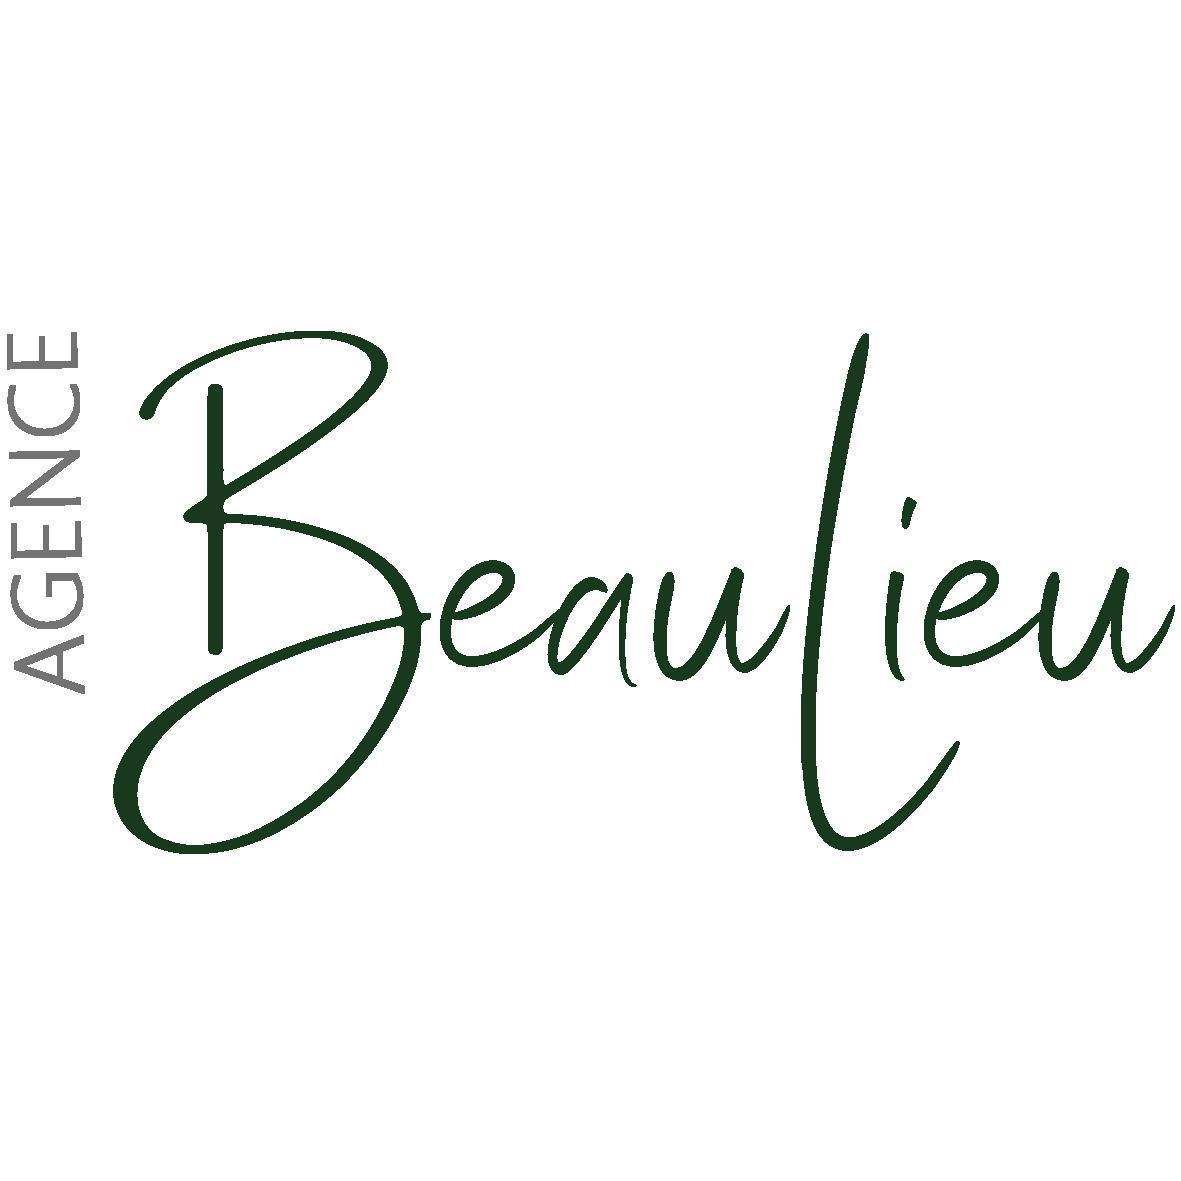 Agence BEAULIEU agence immobilière Saint-Rémy-Lès-Chevreuse (78470)